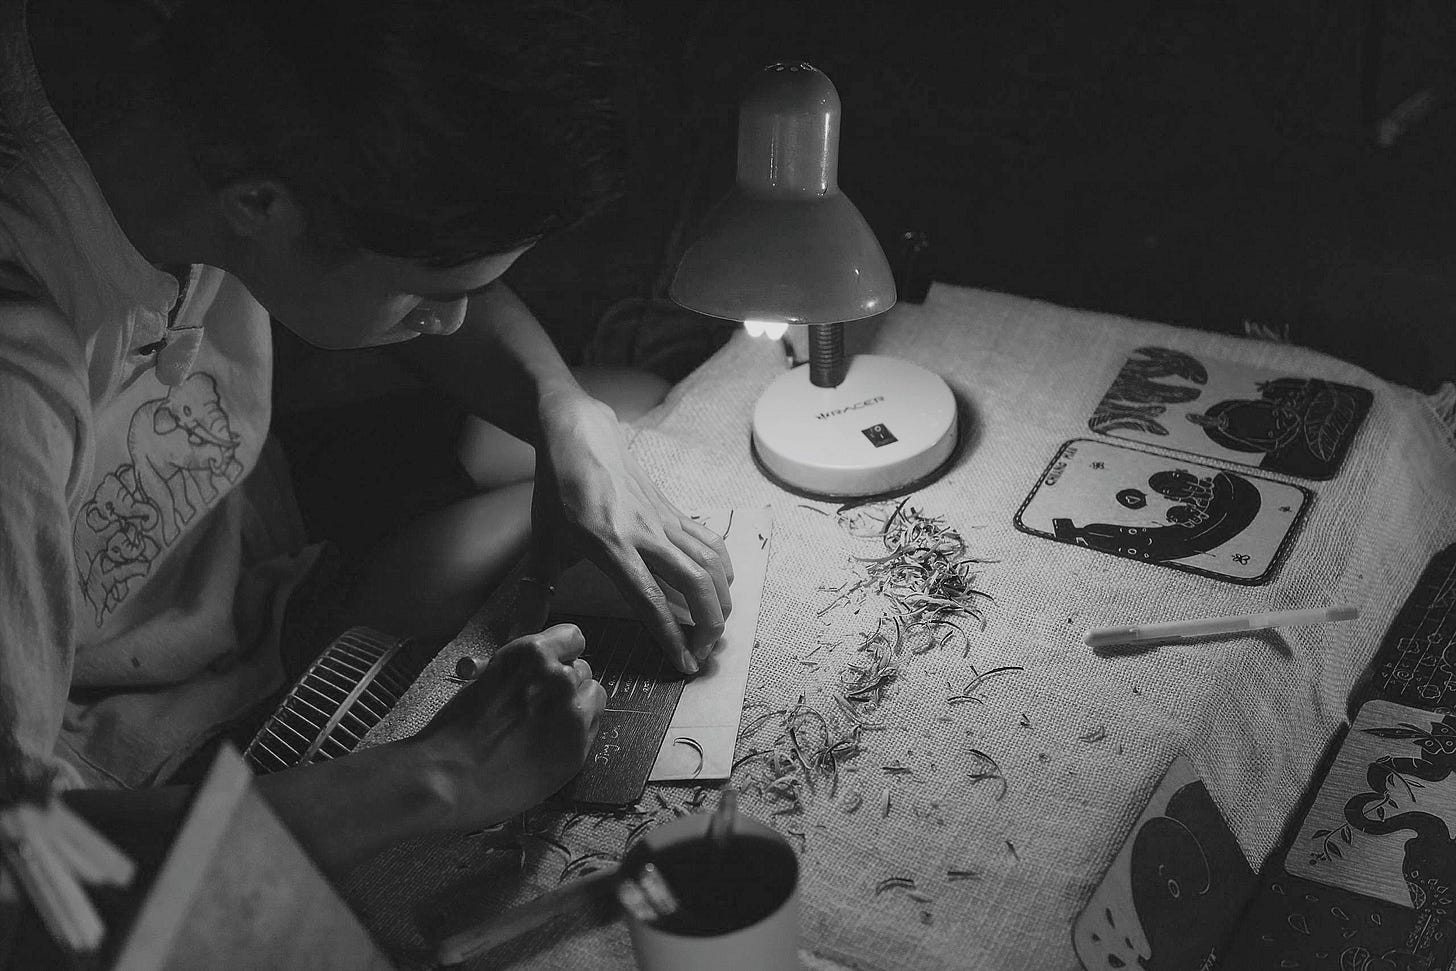 Image of a man making handmade crafts